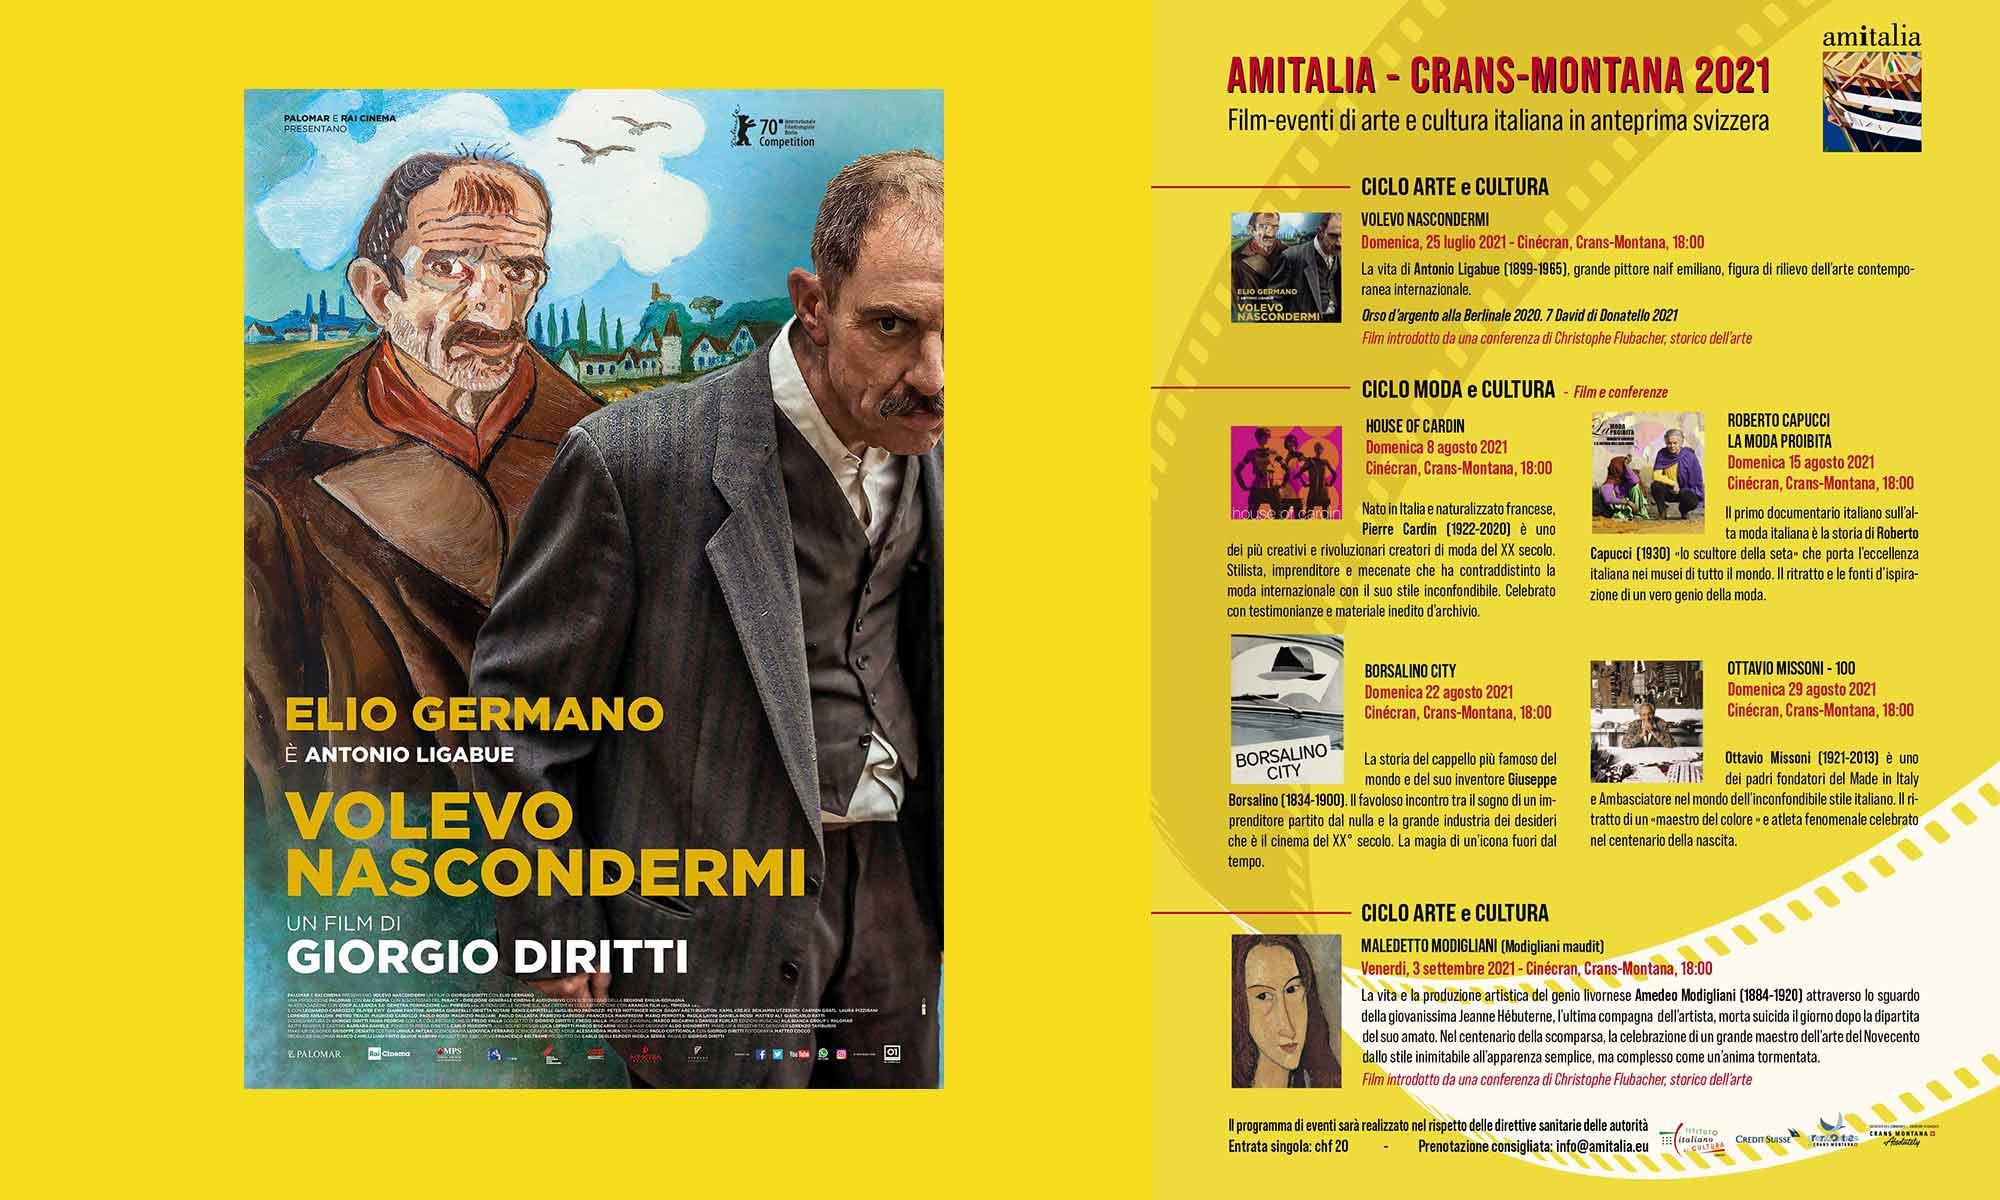 Associazione AMITALIA - Crans-Montana 2021, film-eventi di arte e cultura italiana